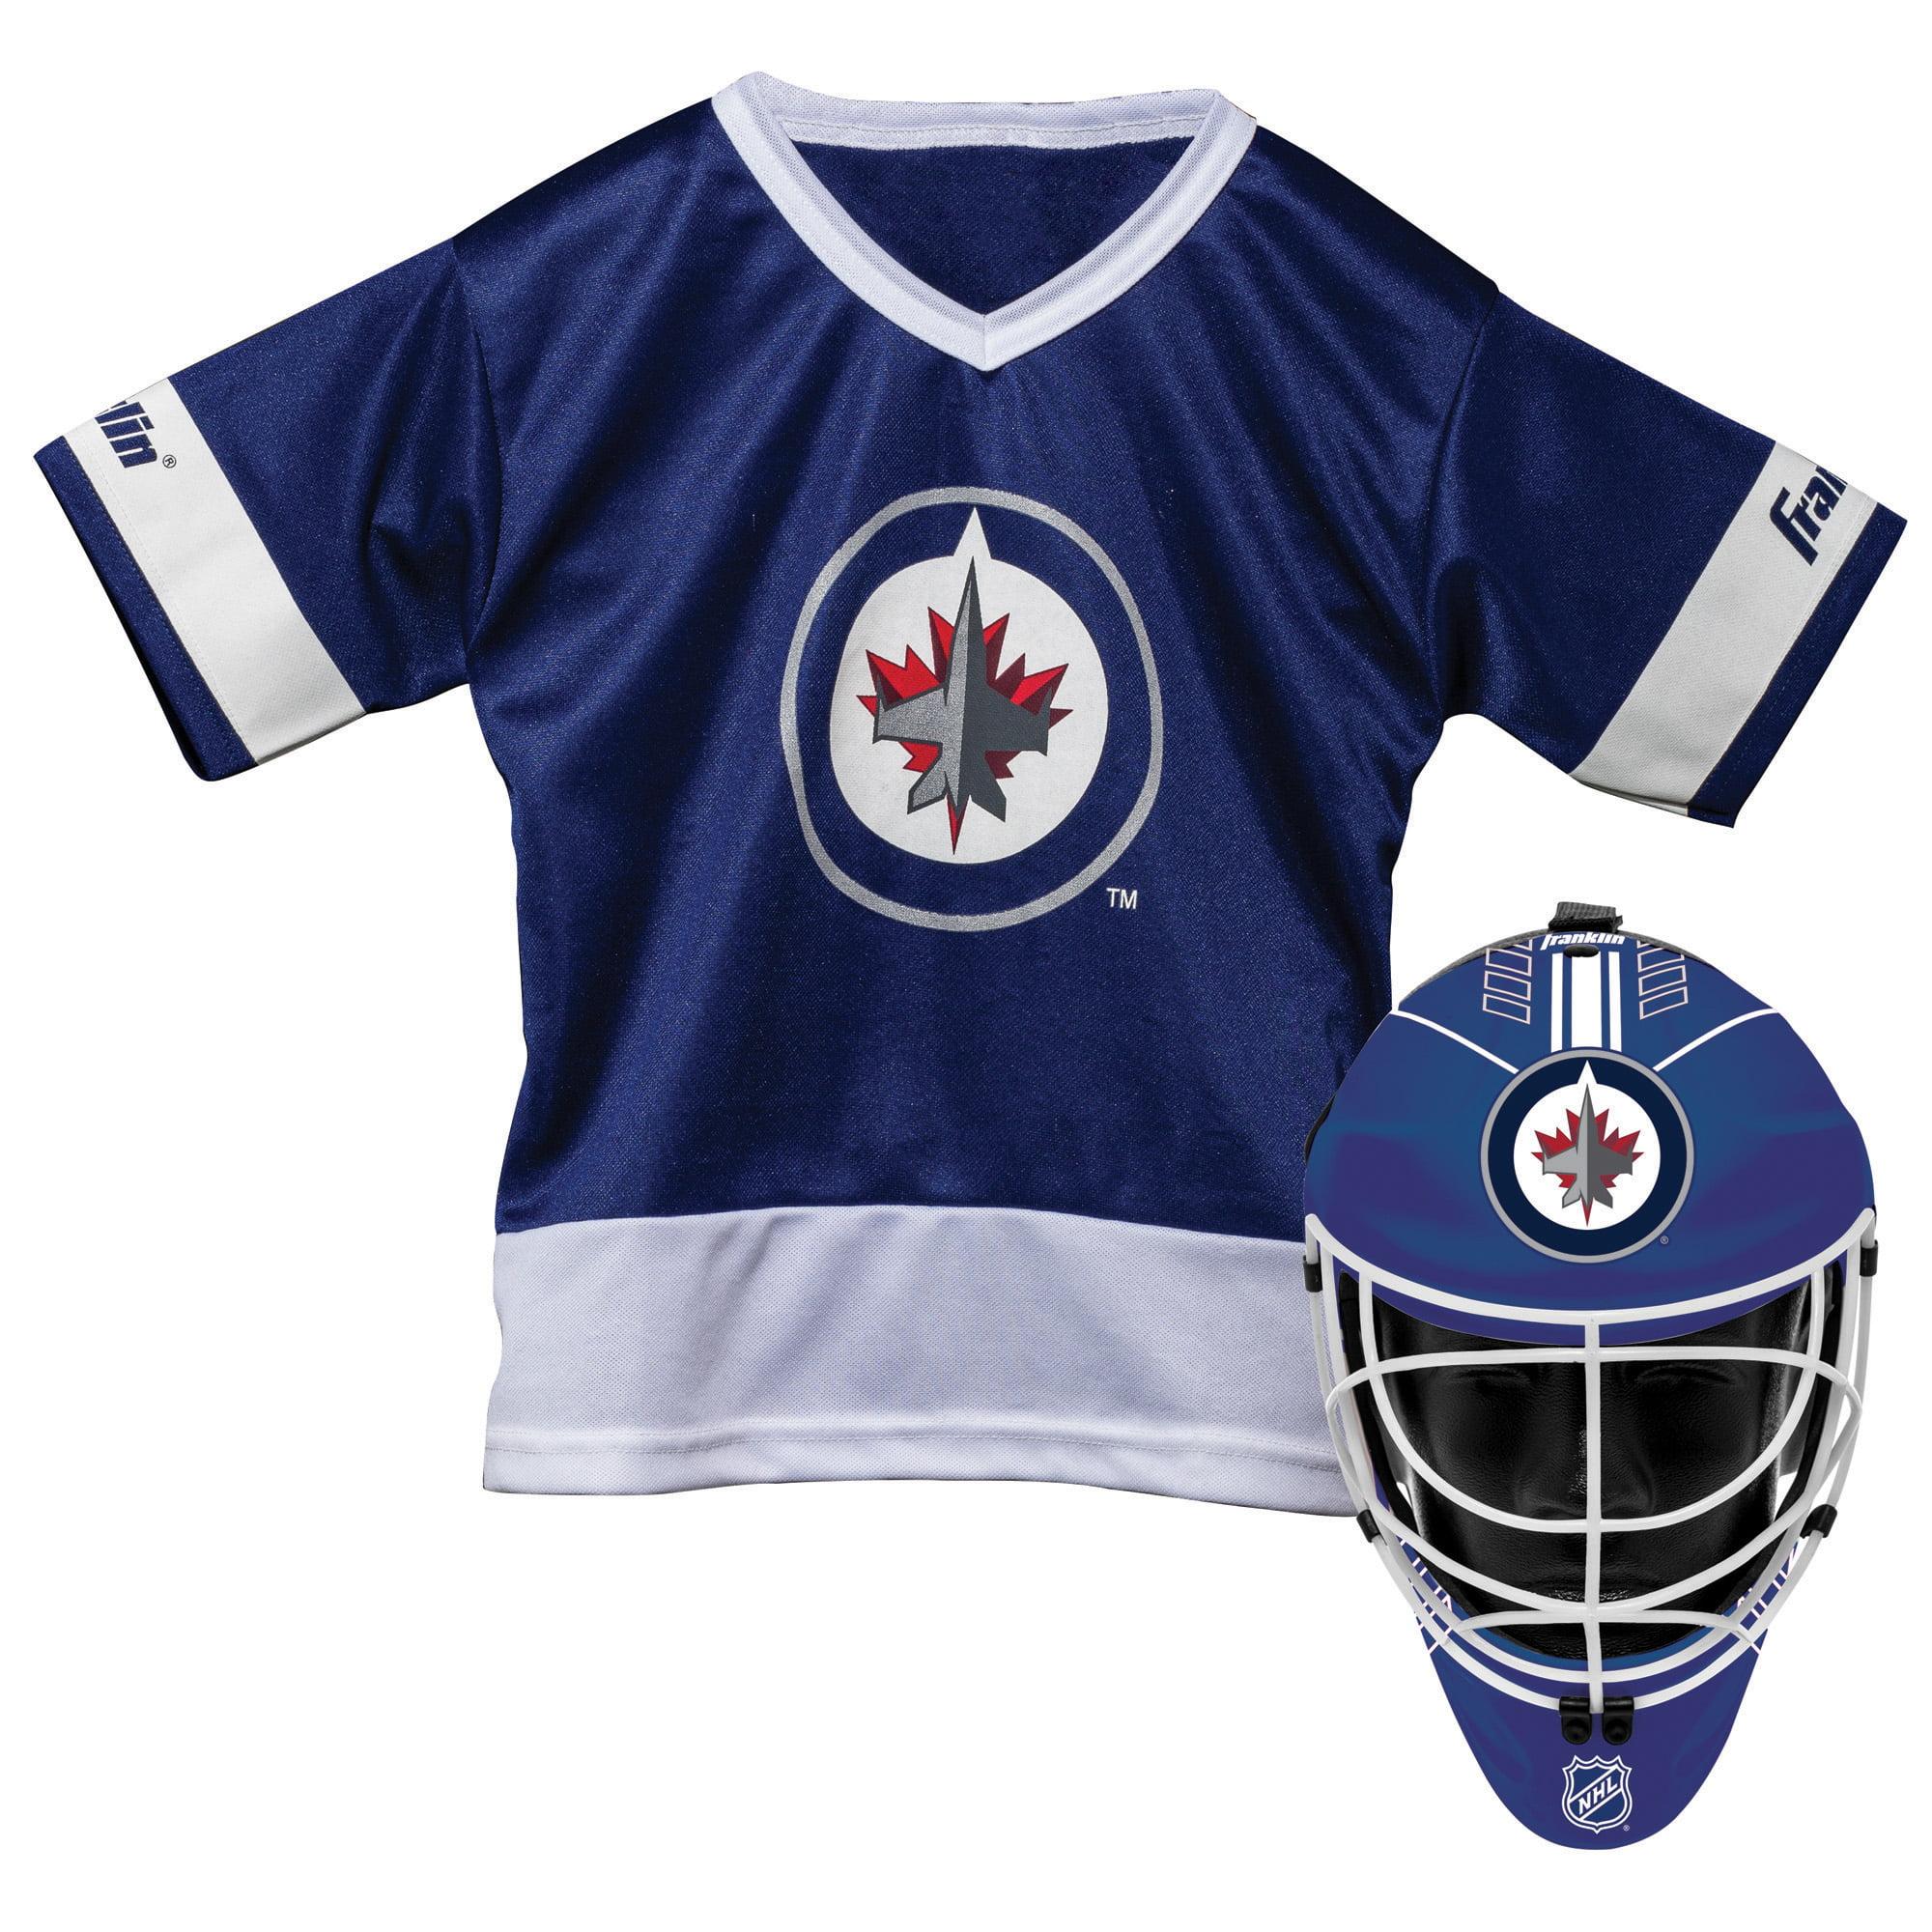 Franklin Sports NHL Winnipeg Jets Youth Team Uniform Set